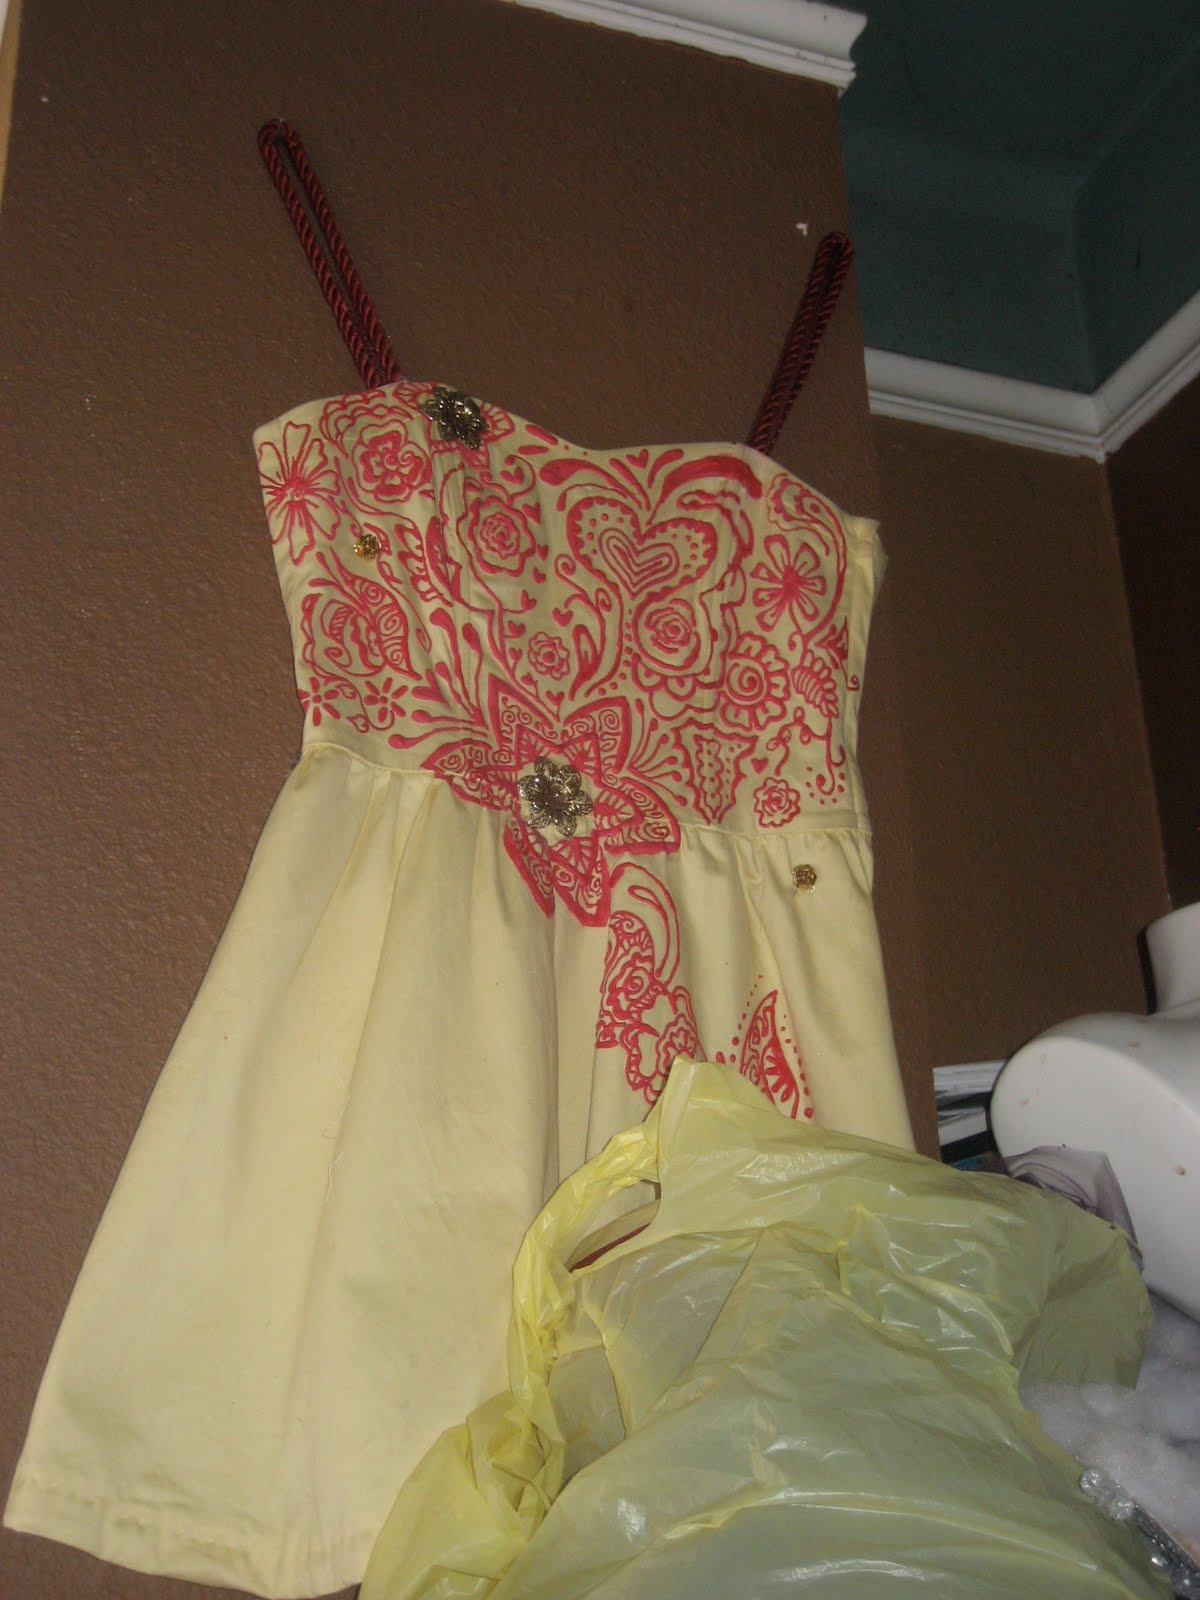 An interview with danielle the dressmaker san francisco Puffy paint shirt designs